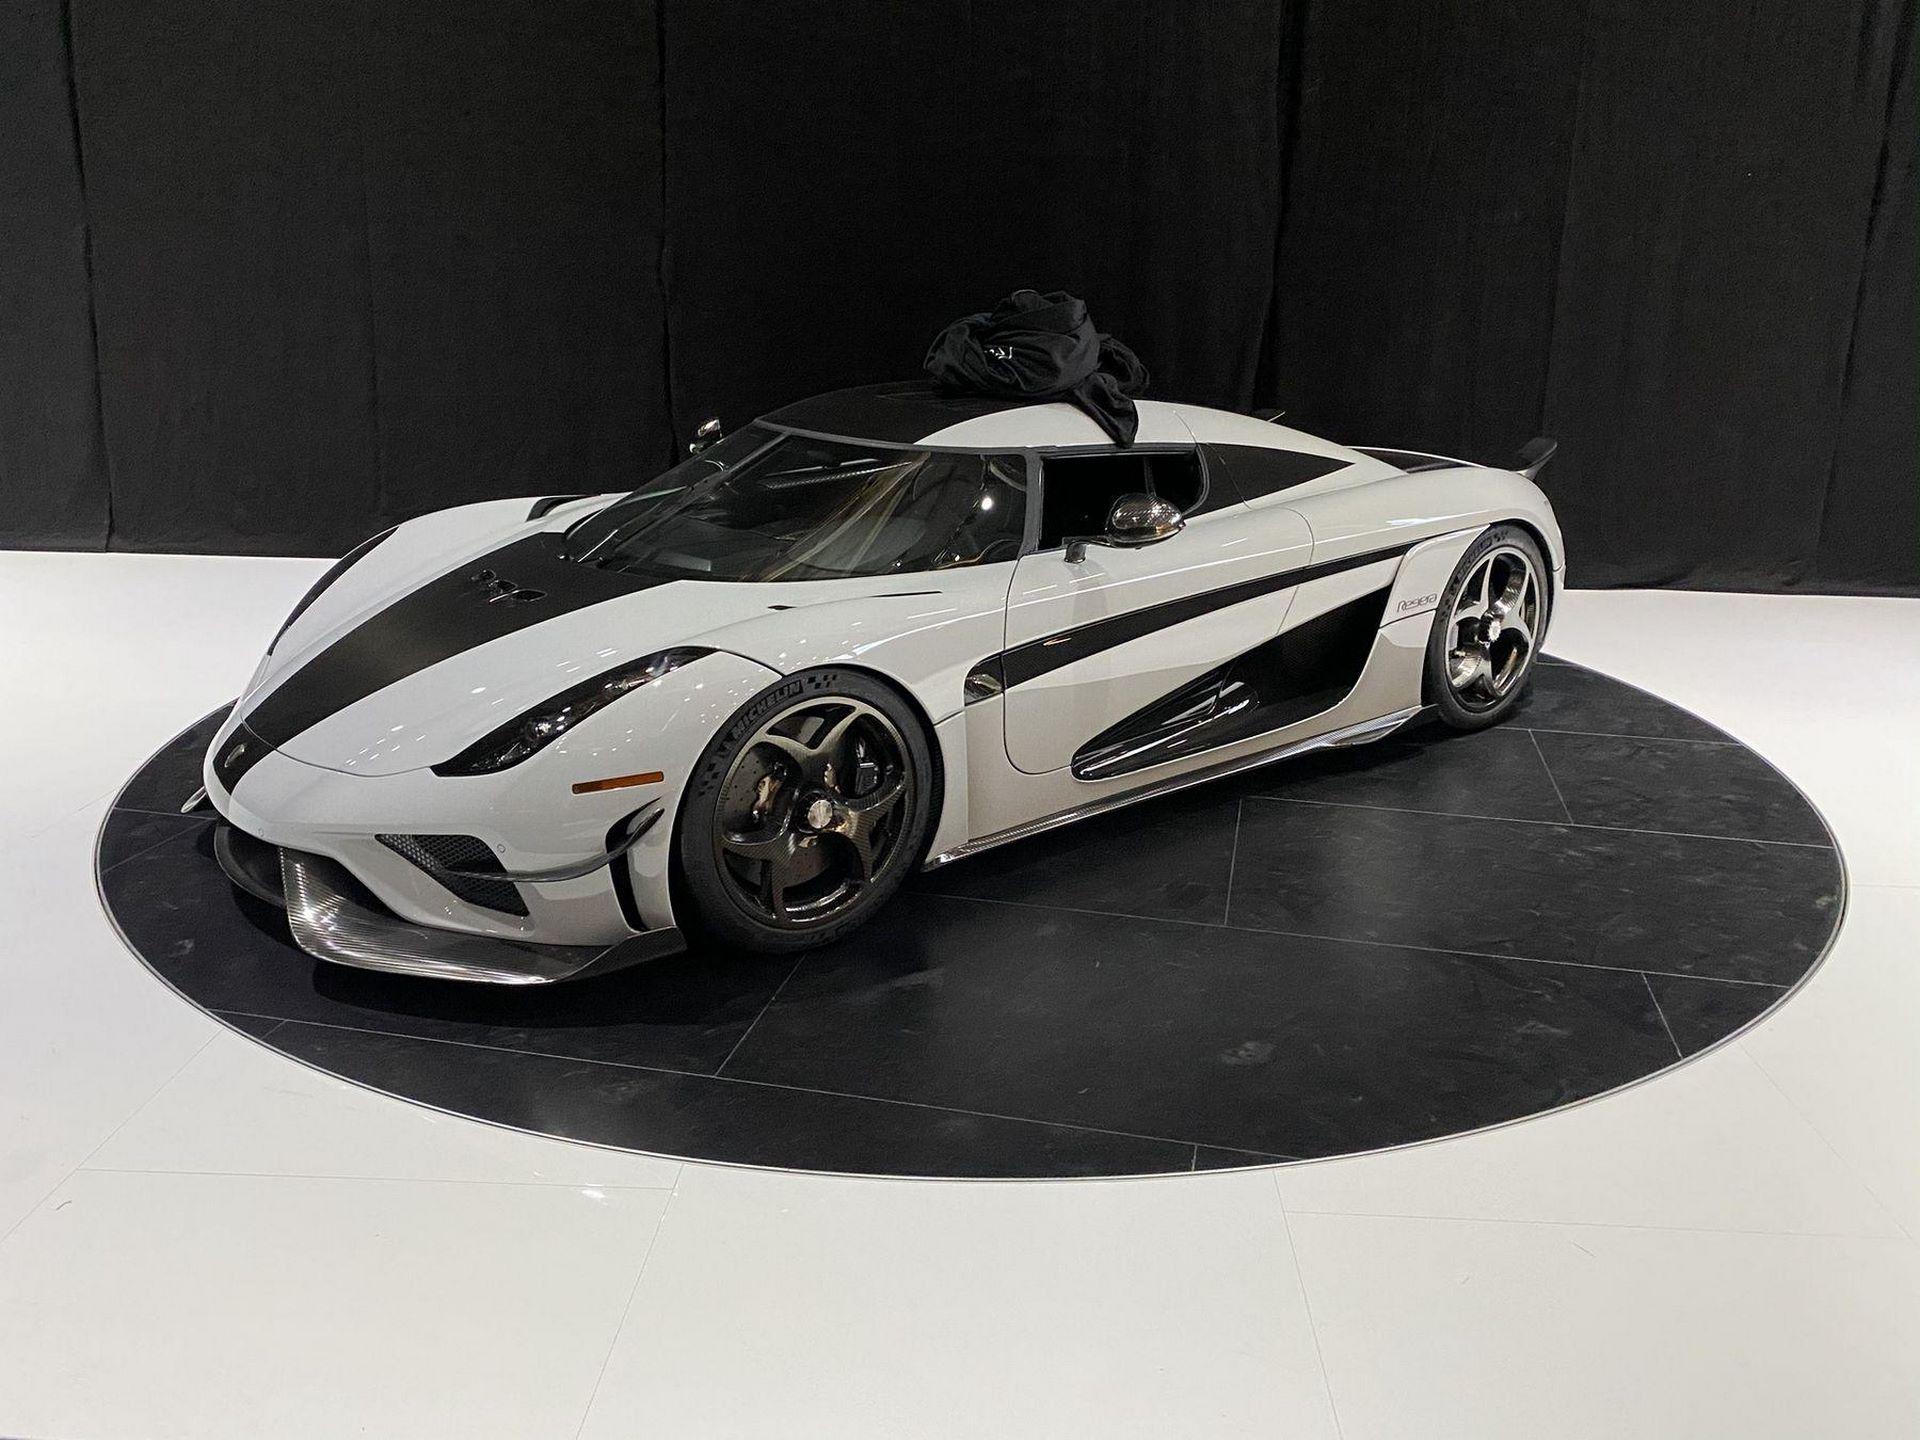 Geneva motor show 2020 (8)